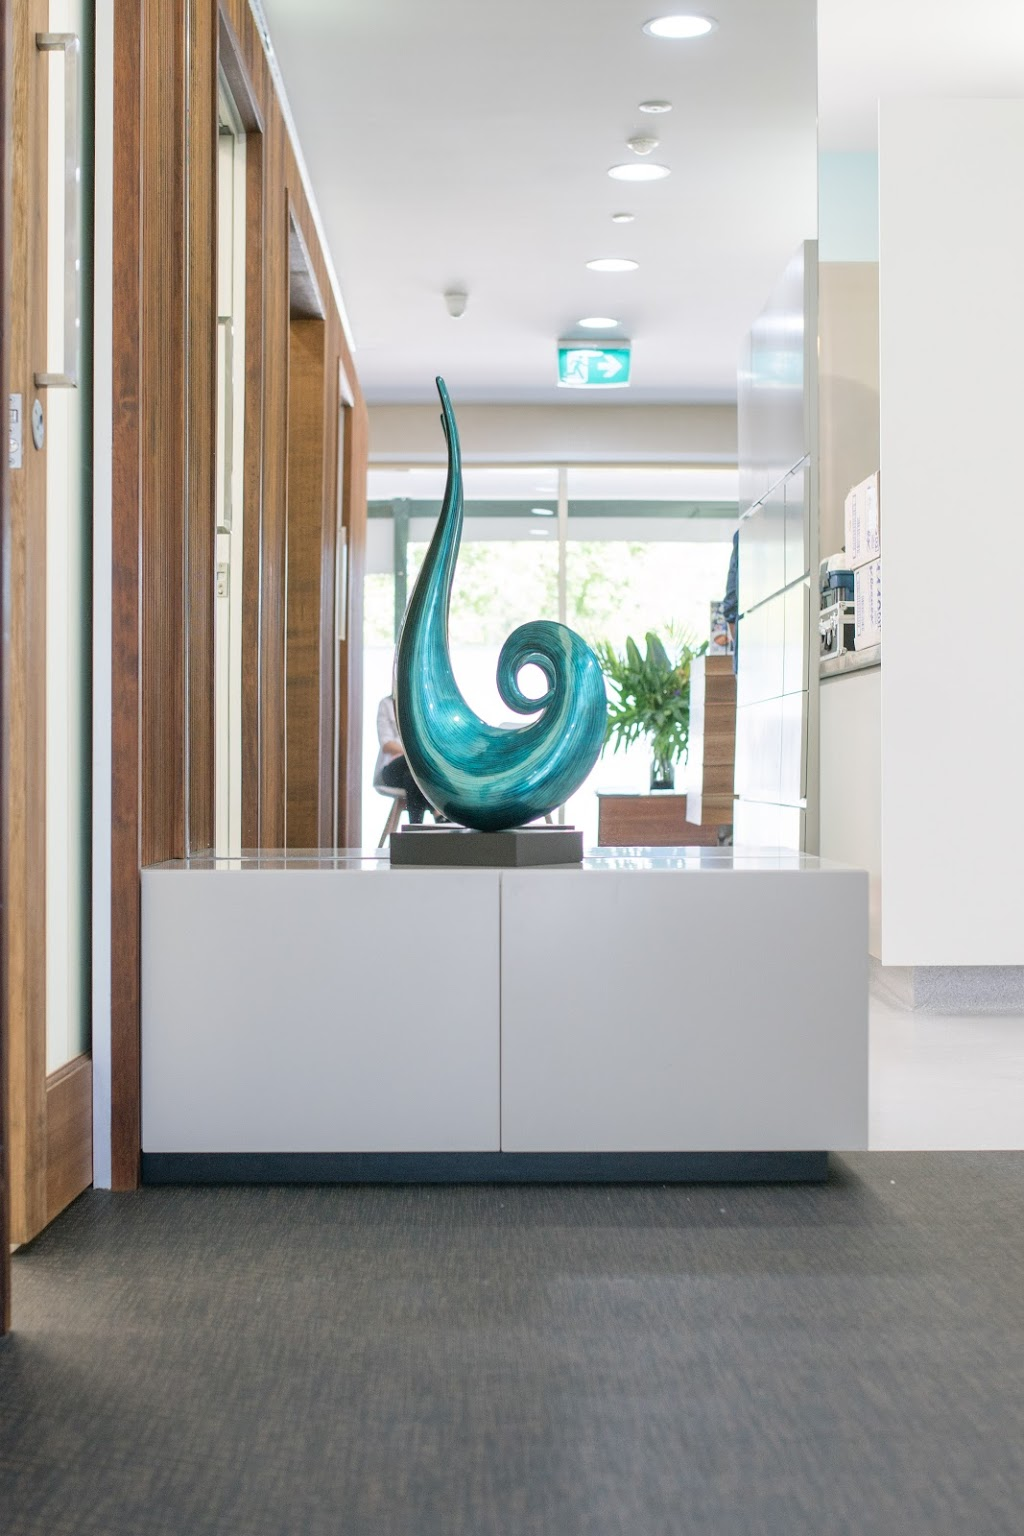 Foundation Dental Services | dentist | 1/128 Golf Links Rd, Mountain Creek QLD 4557, Australia | 0738782519 OR +61 7 3878 2519